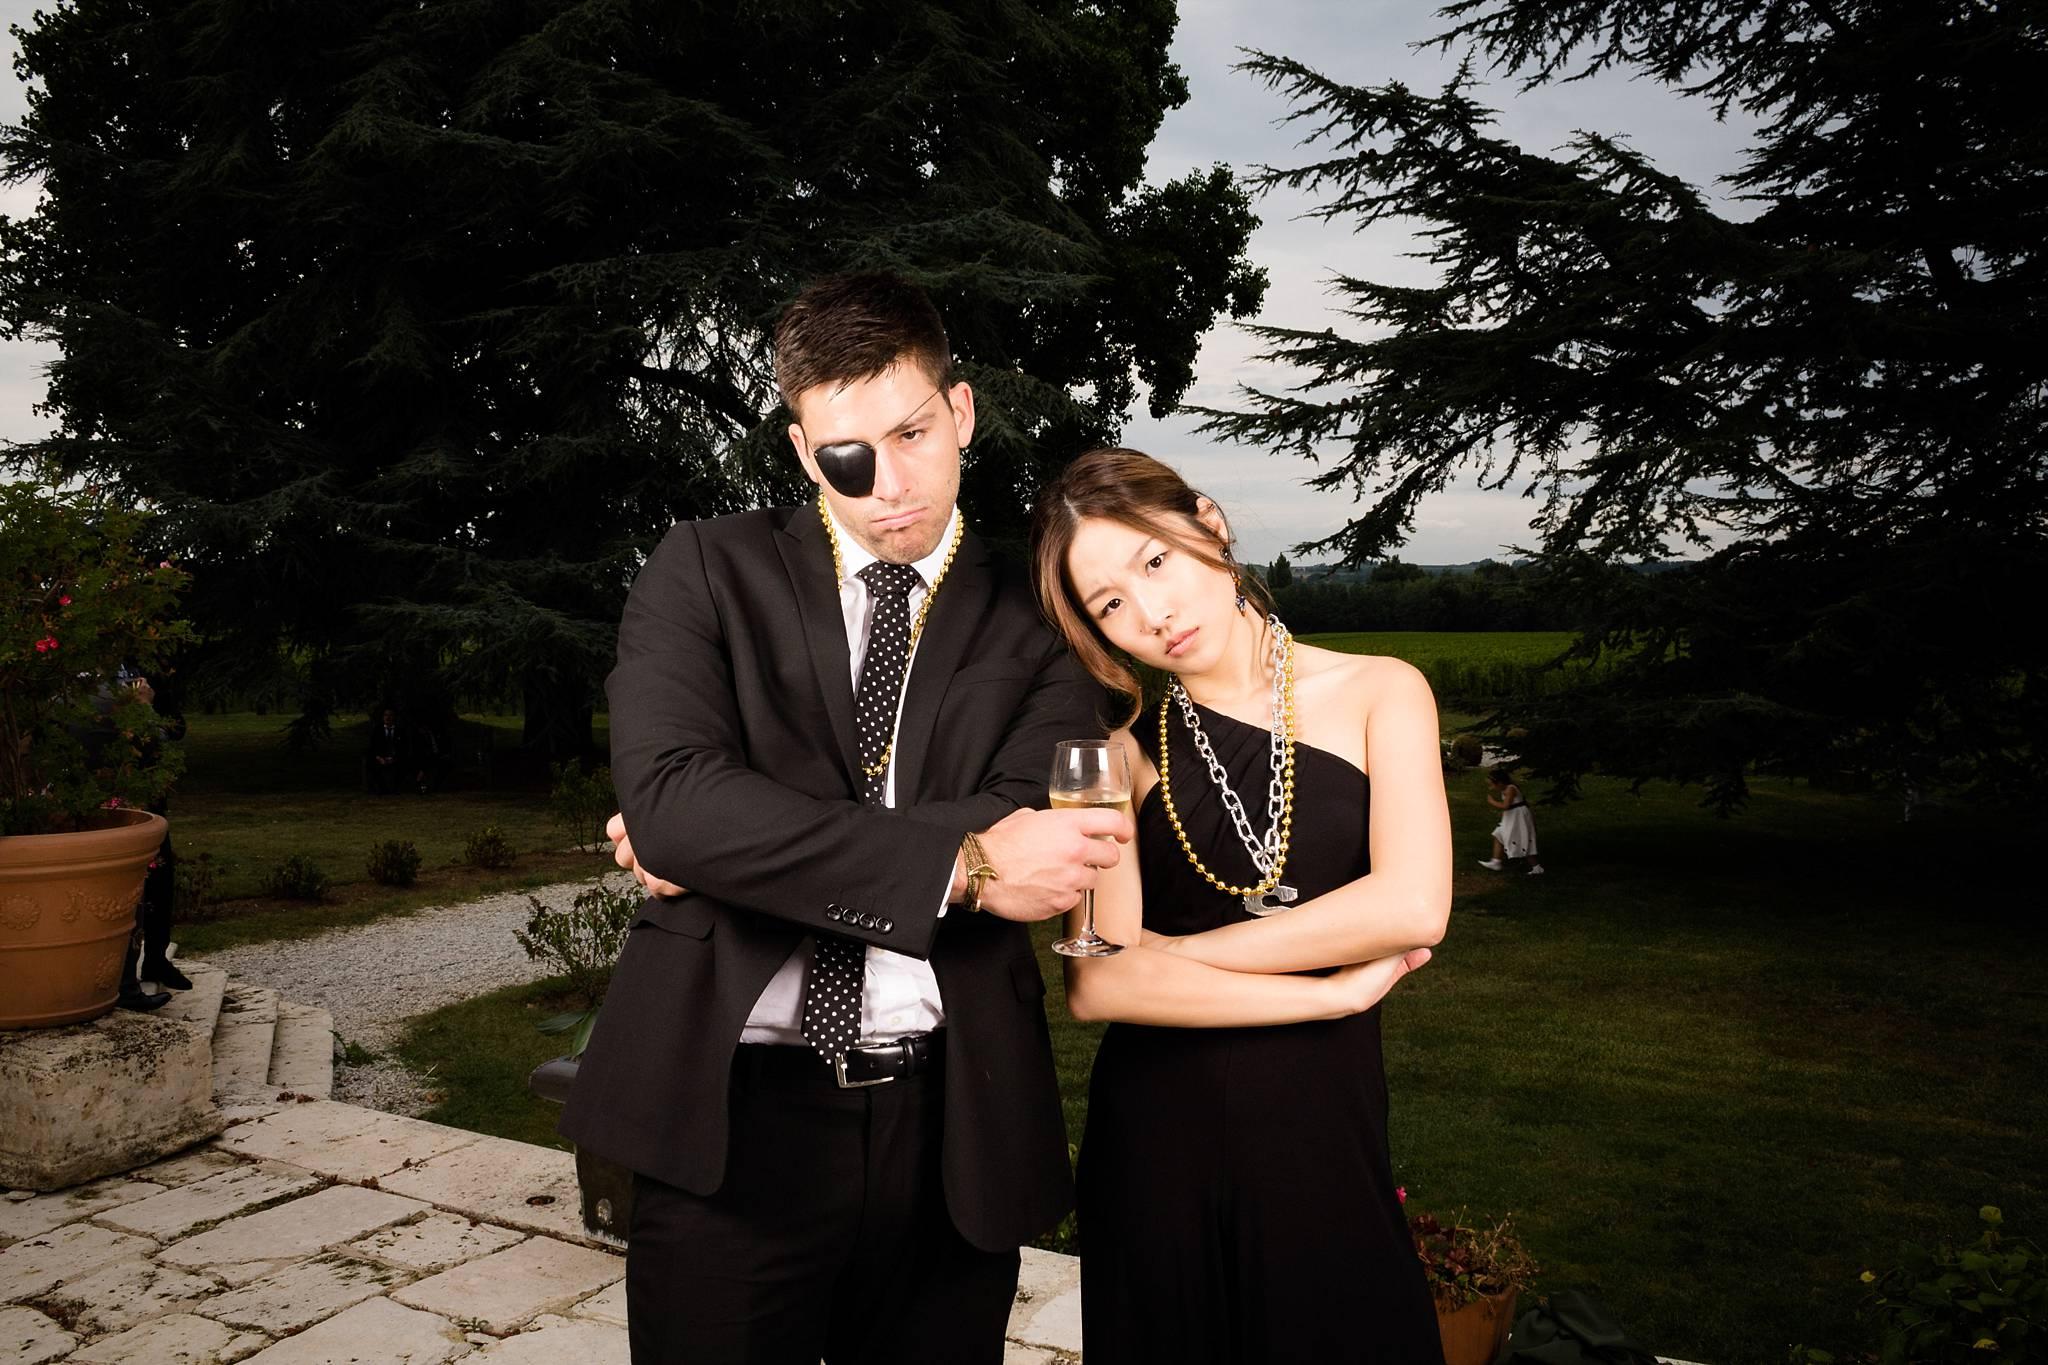 15_photobooth-mariage-bordeaux-gironde-dordogne-charentes-alexandre-roschewitz-photographies_2048px